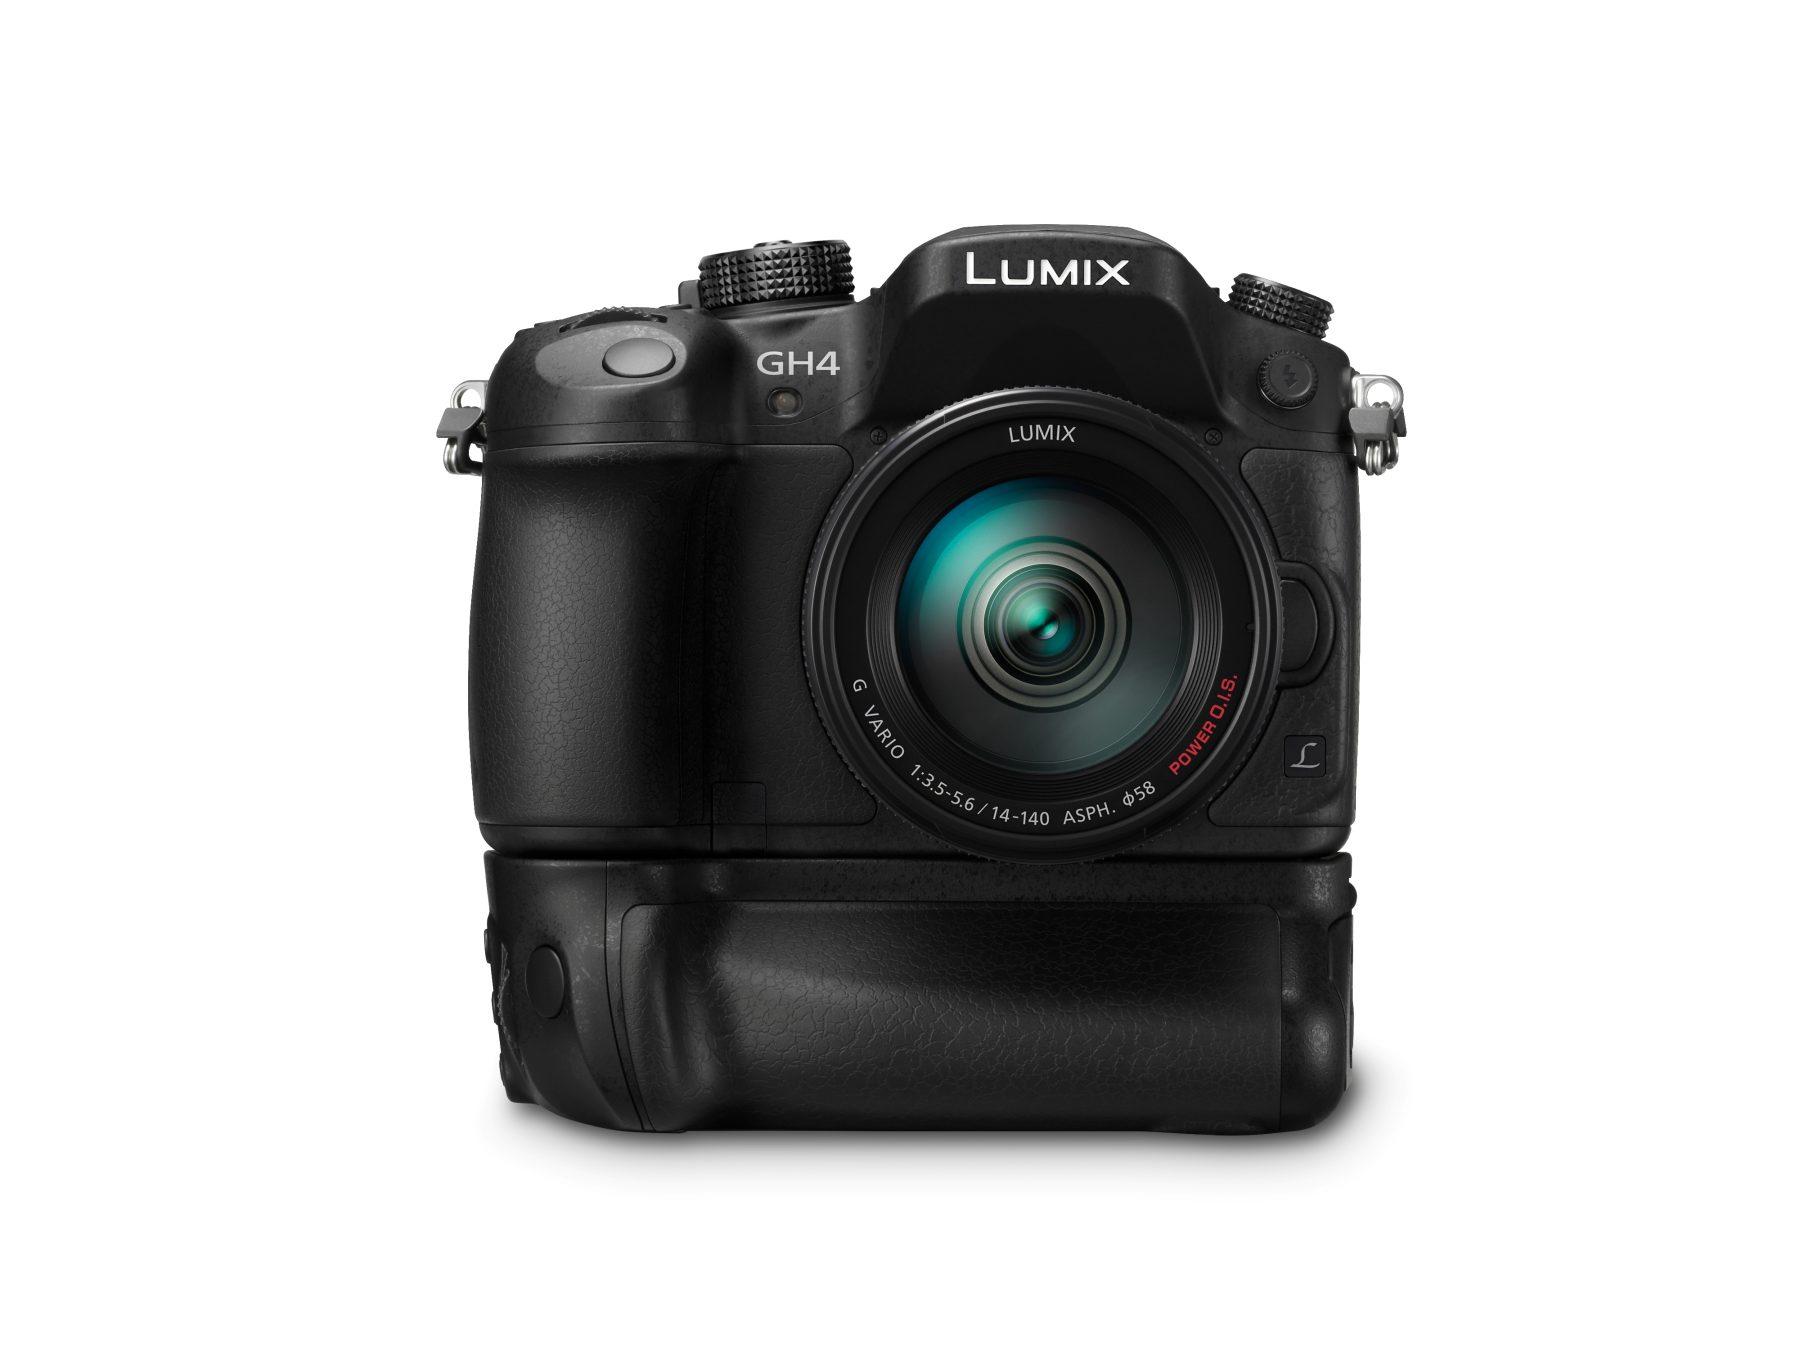 Panasonic GH4 Lumix